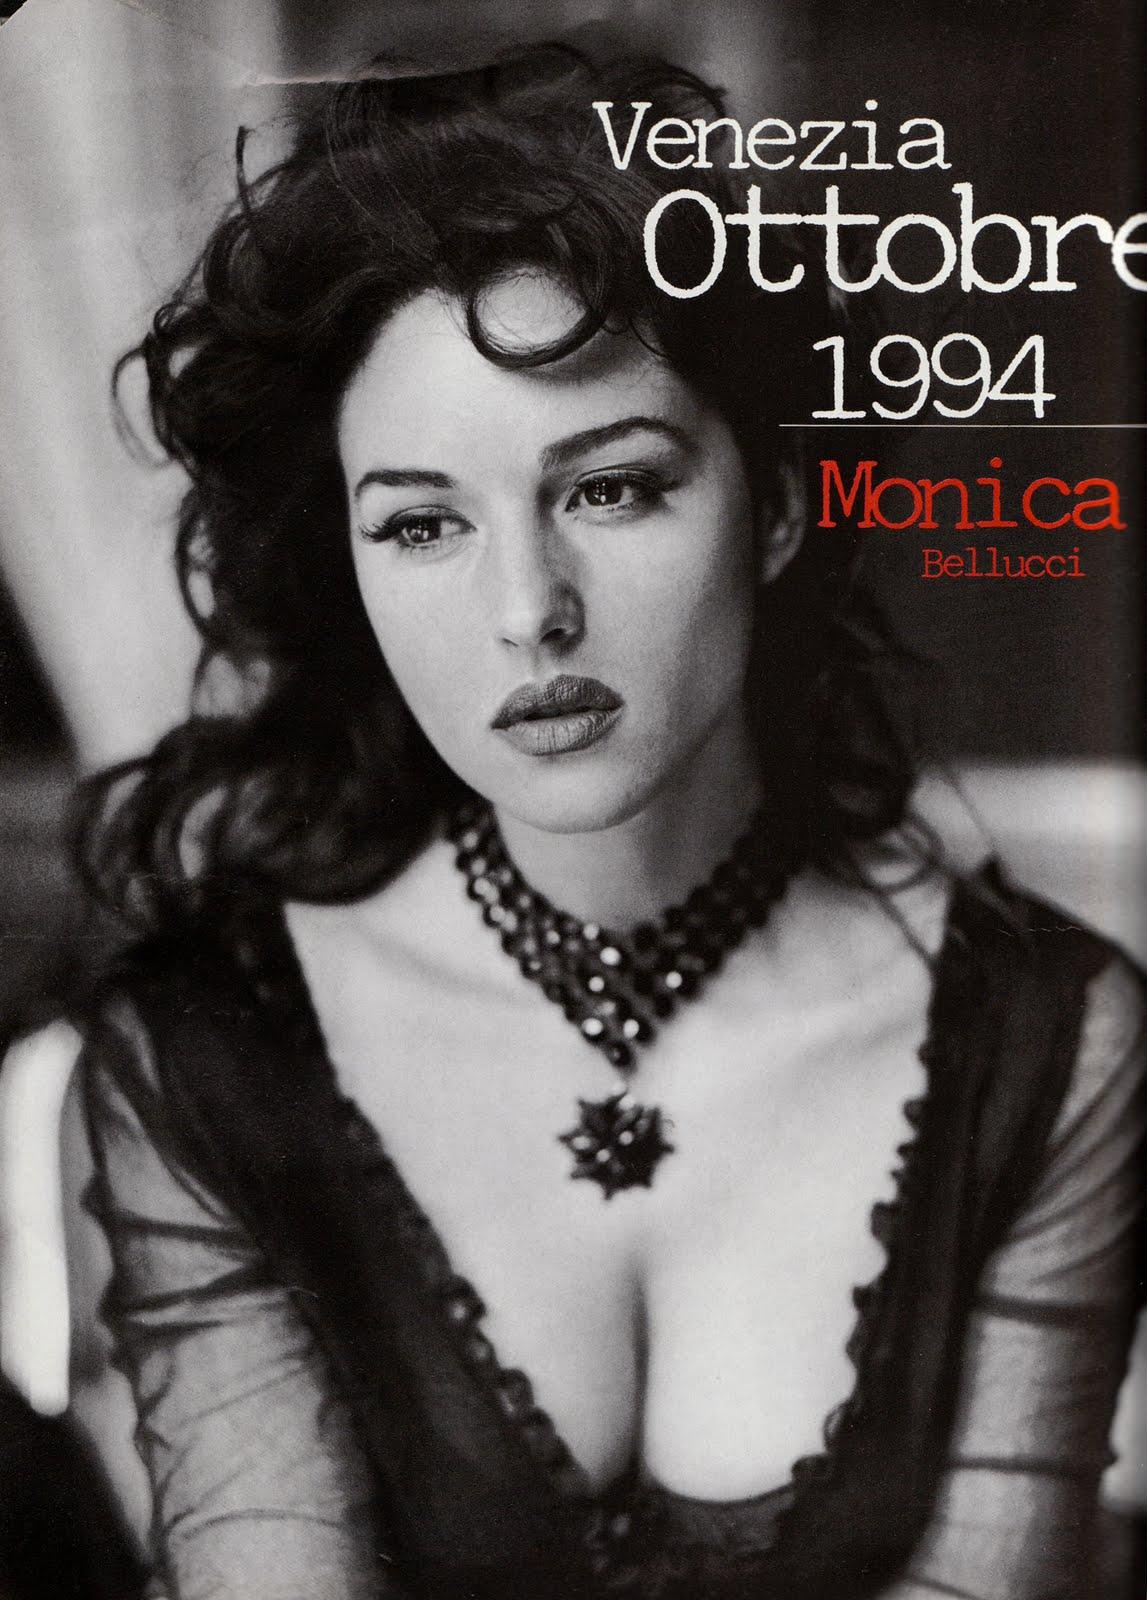 http://4.bp.blogspot.com/-HTUjXFB-G6k/TbNT-YfCkkI/AAAAAAAADkI/SmeEOpzQSKE/s1600/Monica+Bellucci+150.jpg